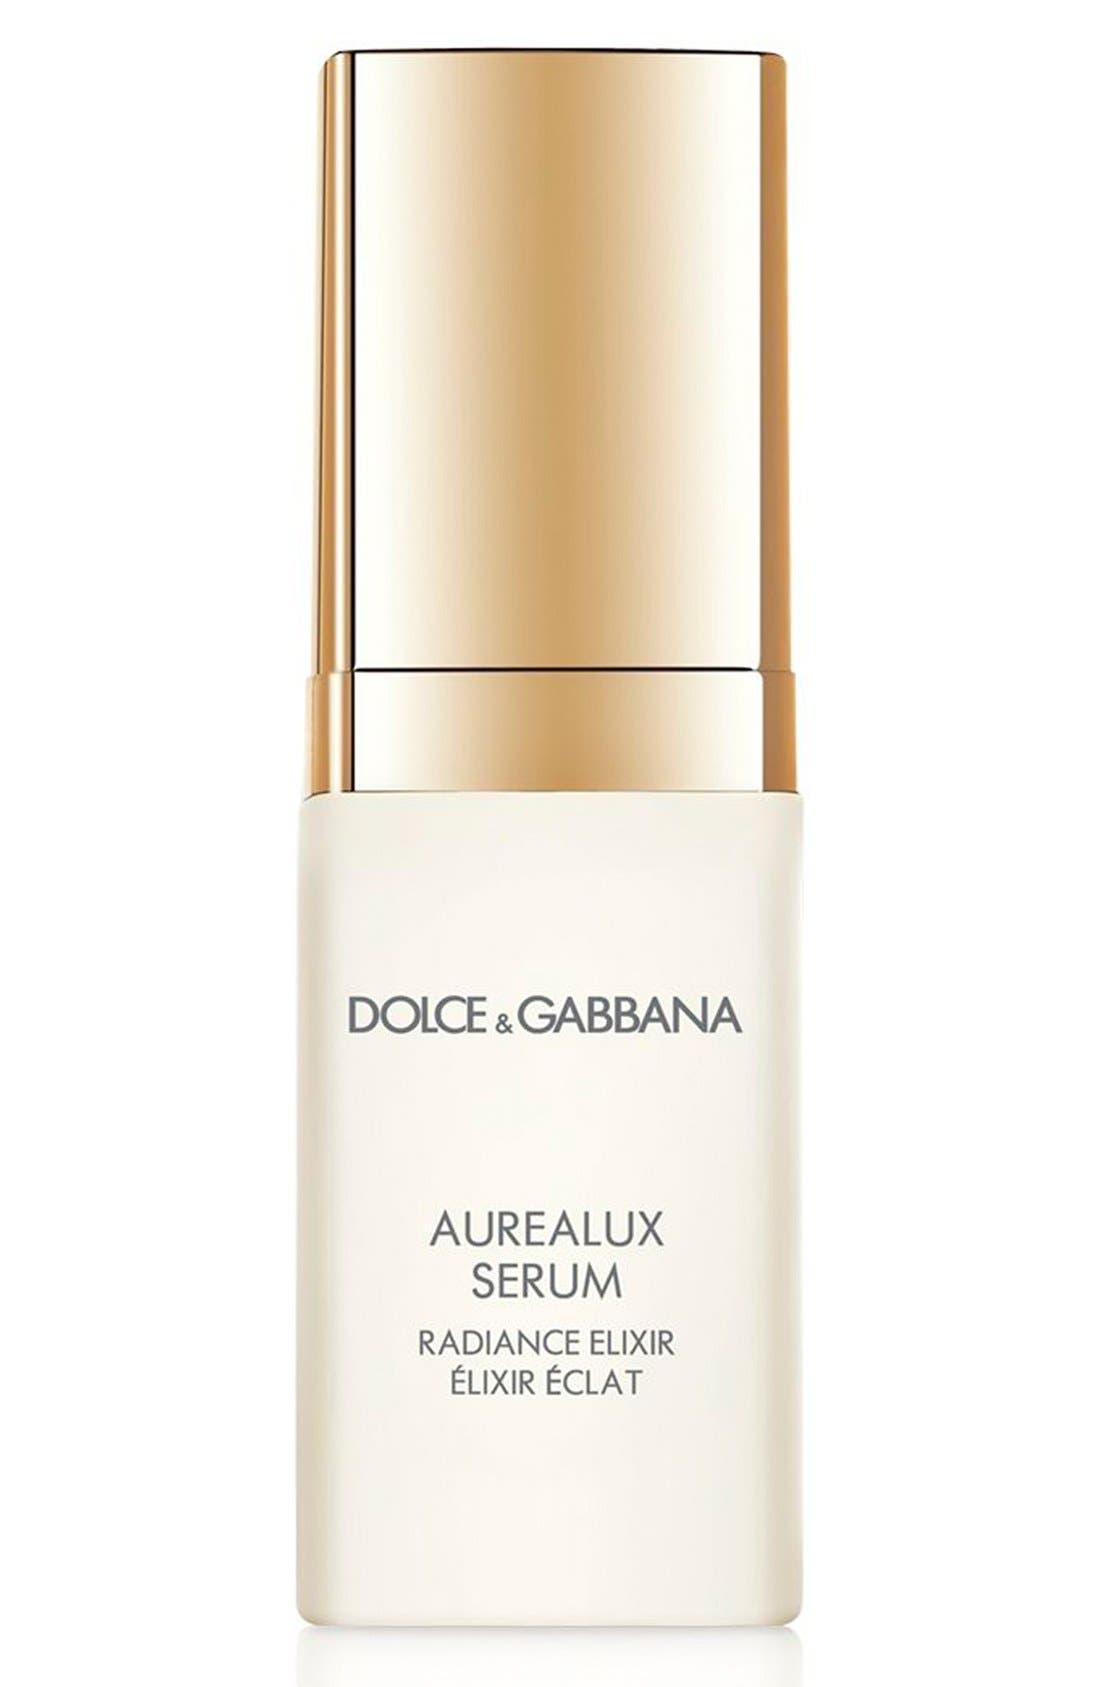 Dolce&GabbanaBeauty 'Aurealux' Serum Radiance Elixir,                         Main,                         color, 000